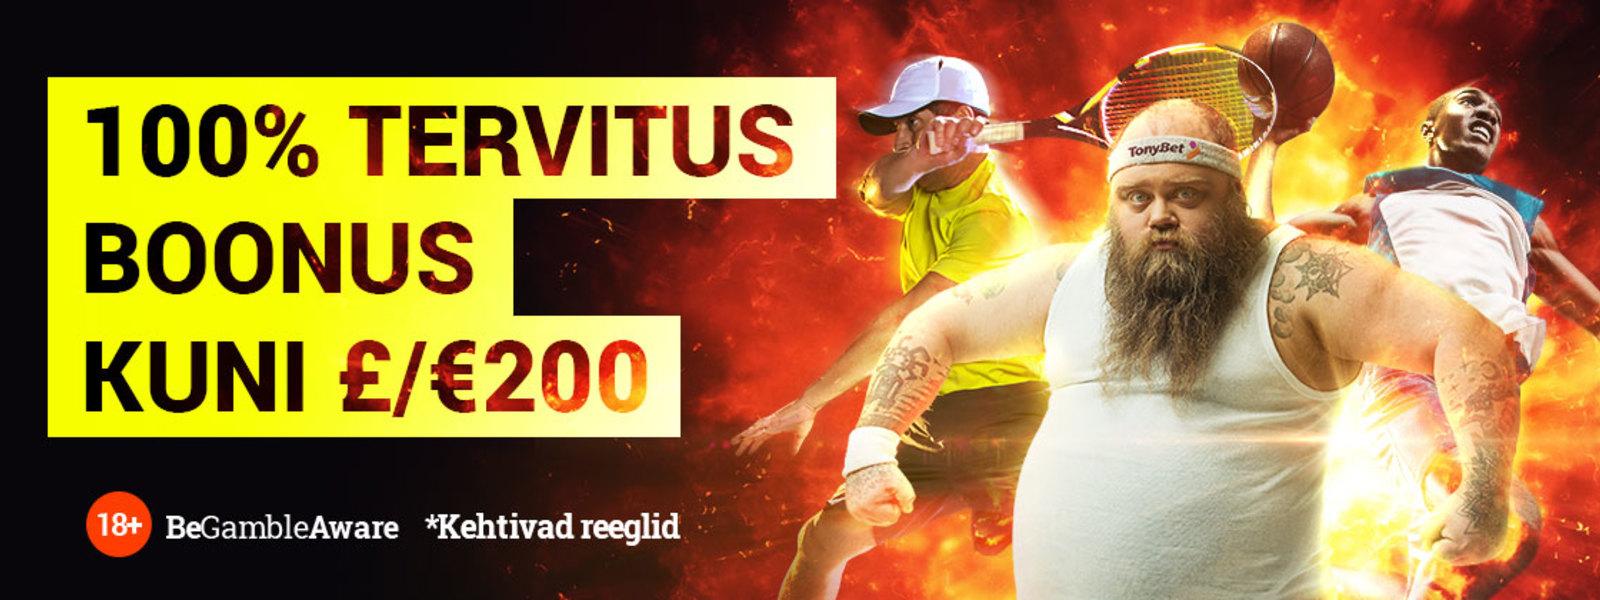 TonyBet Spordi Tervitusboonus: 200% kuni 200€